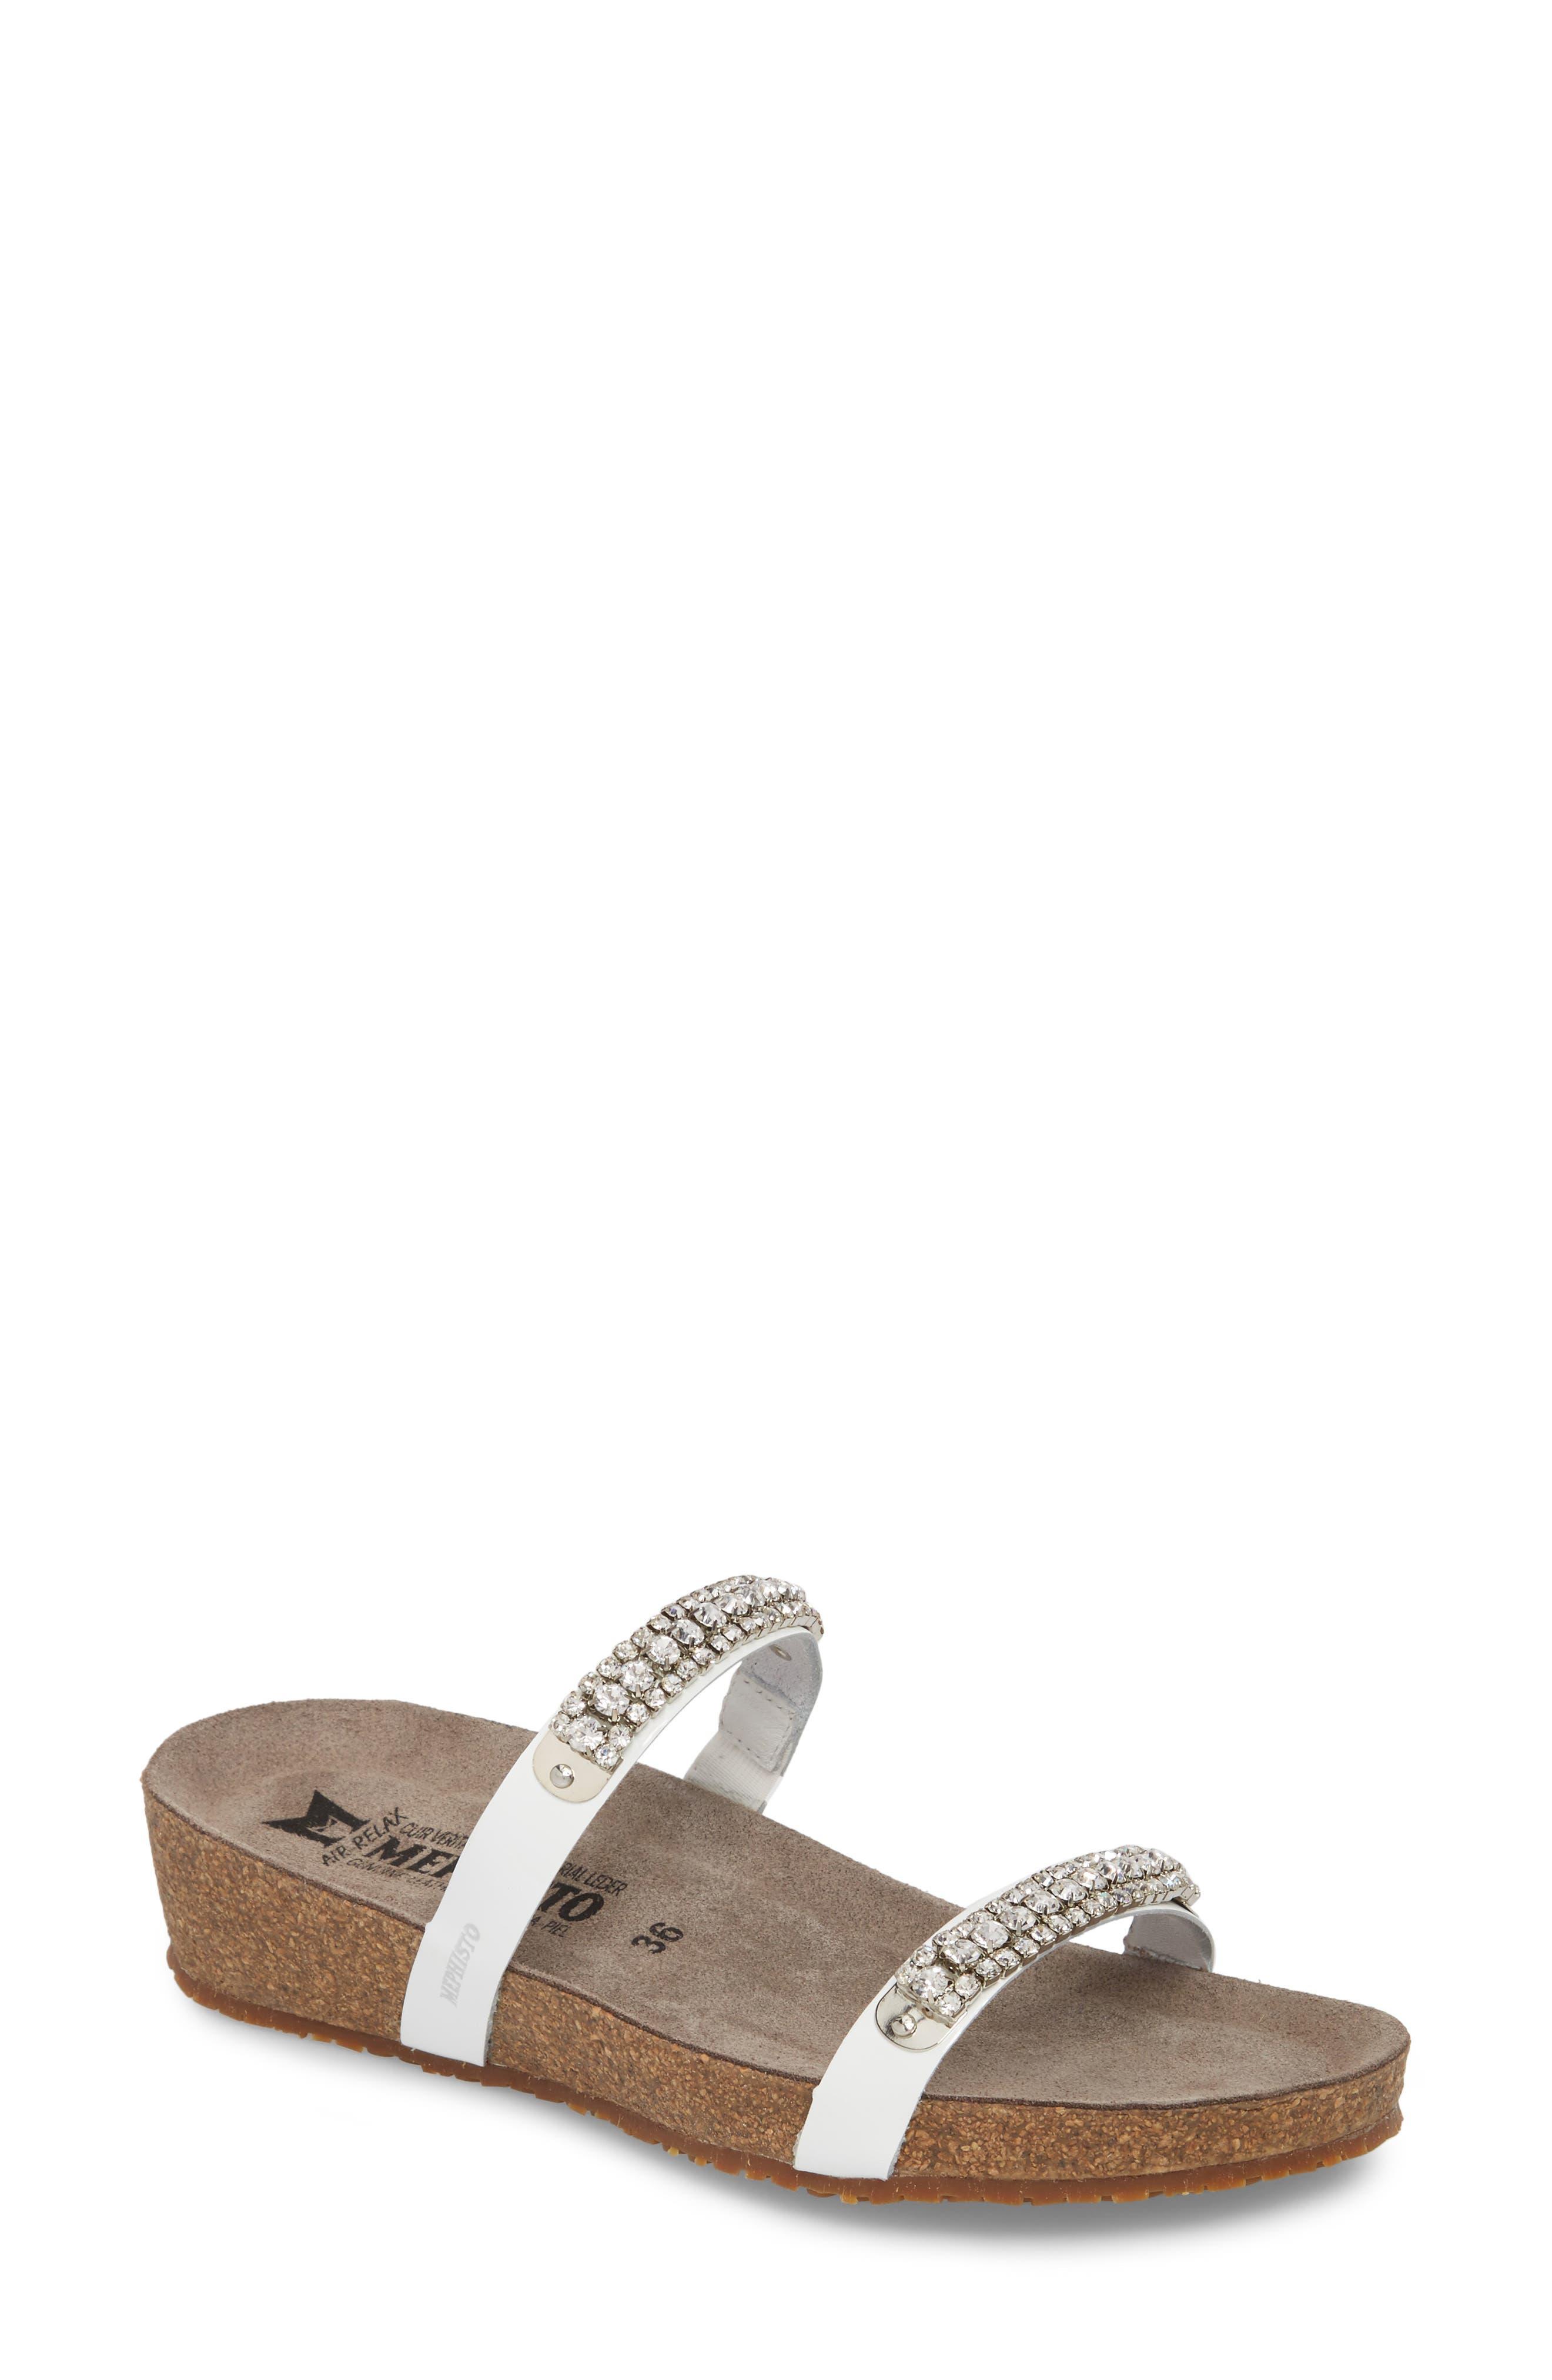 'Ivana' Crystal Embellished Slide Sandal,                             Main thumbnail 1, color,                             White Patent